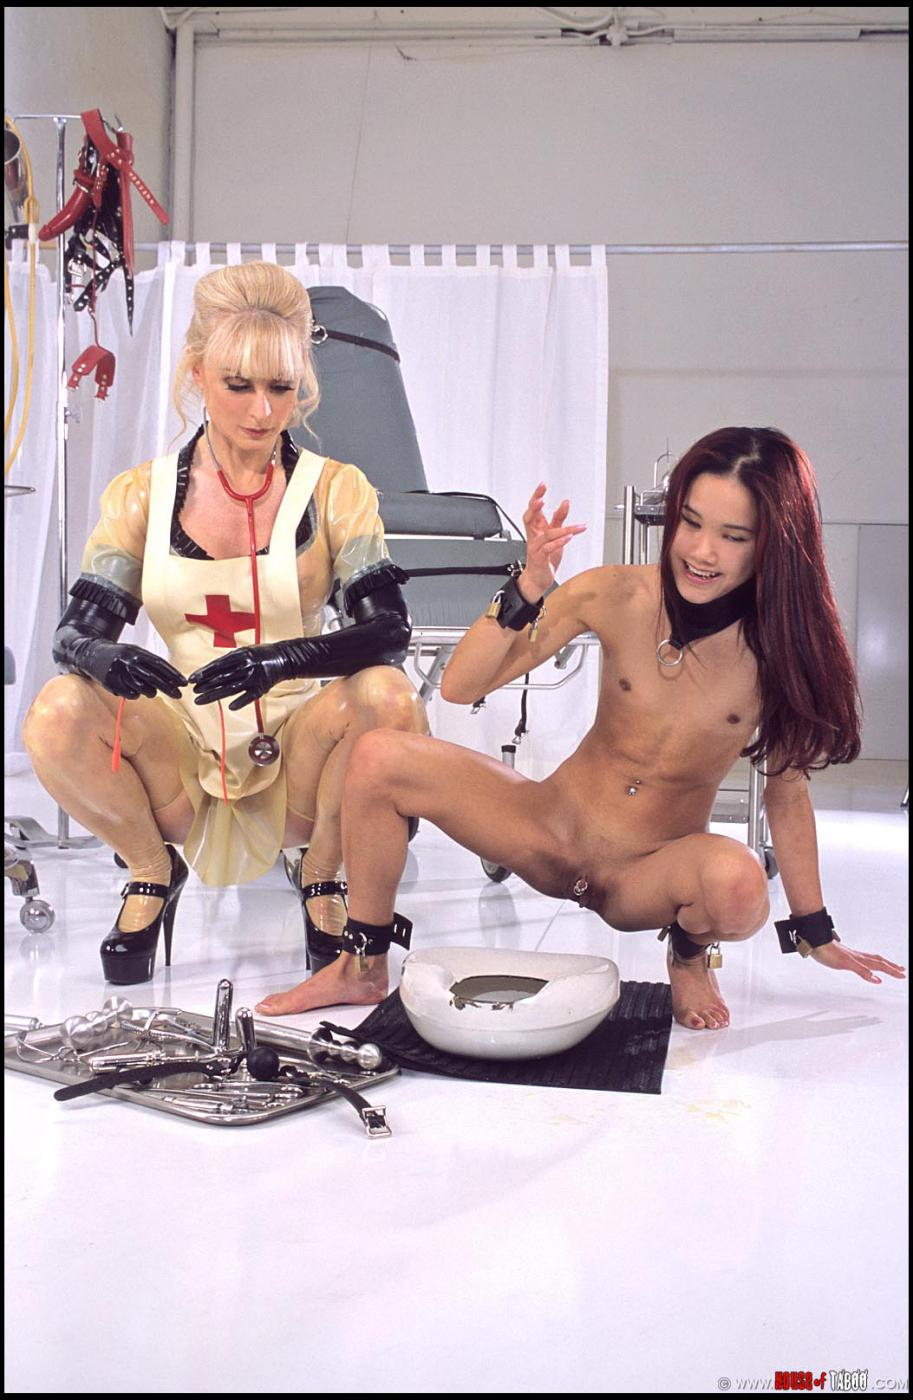 Nina Hartley Videos nina hartley peeing video - porn tube. comments: 2